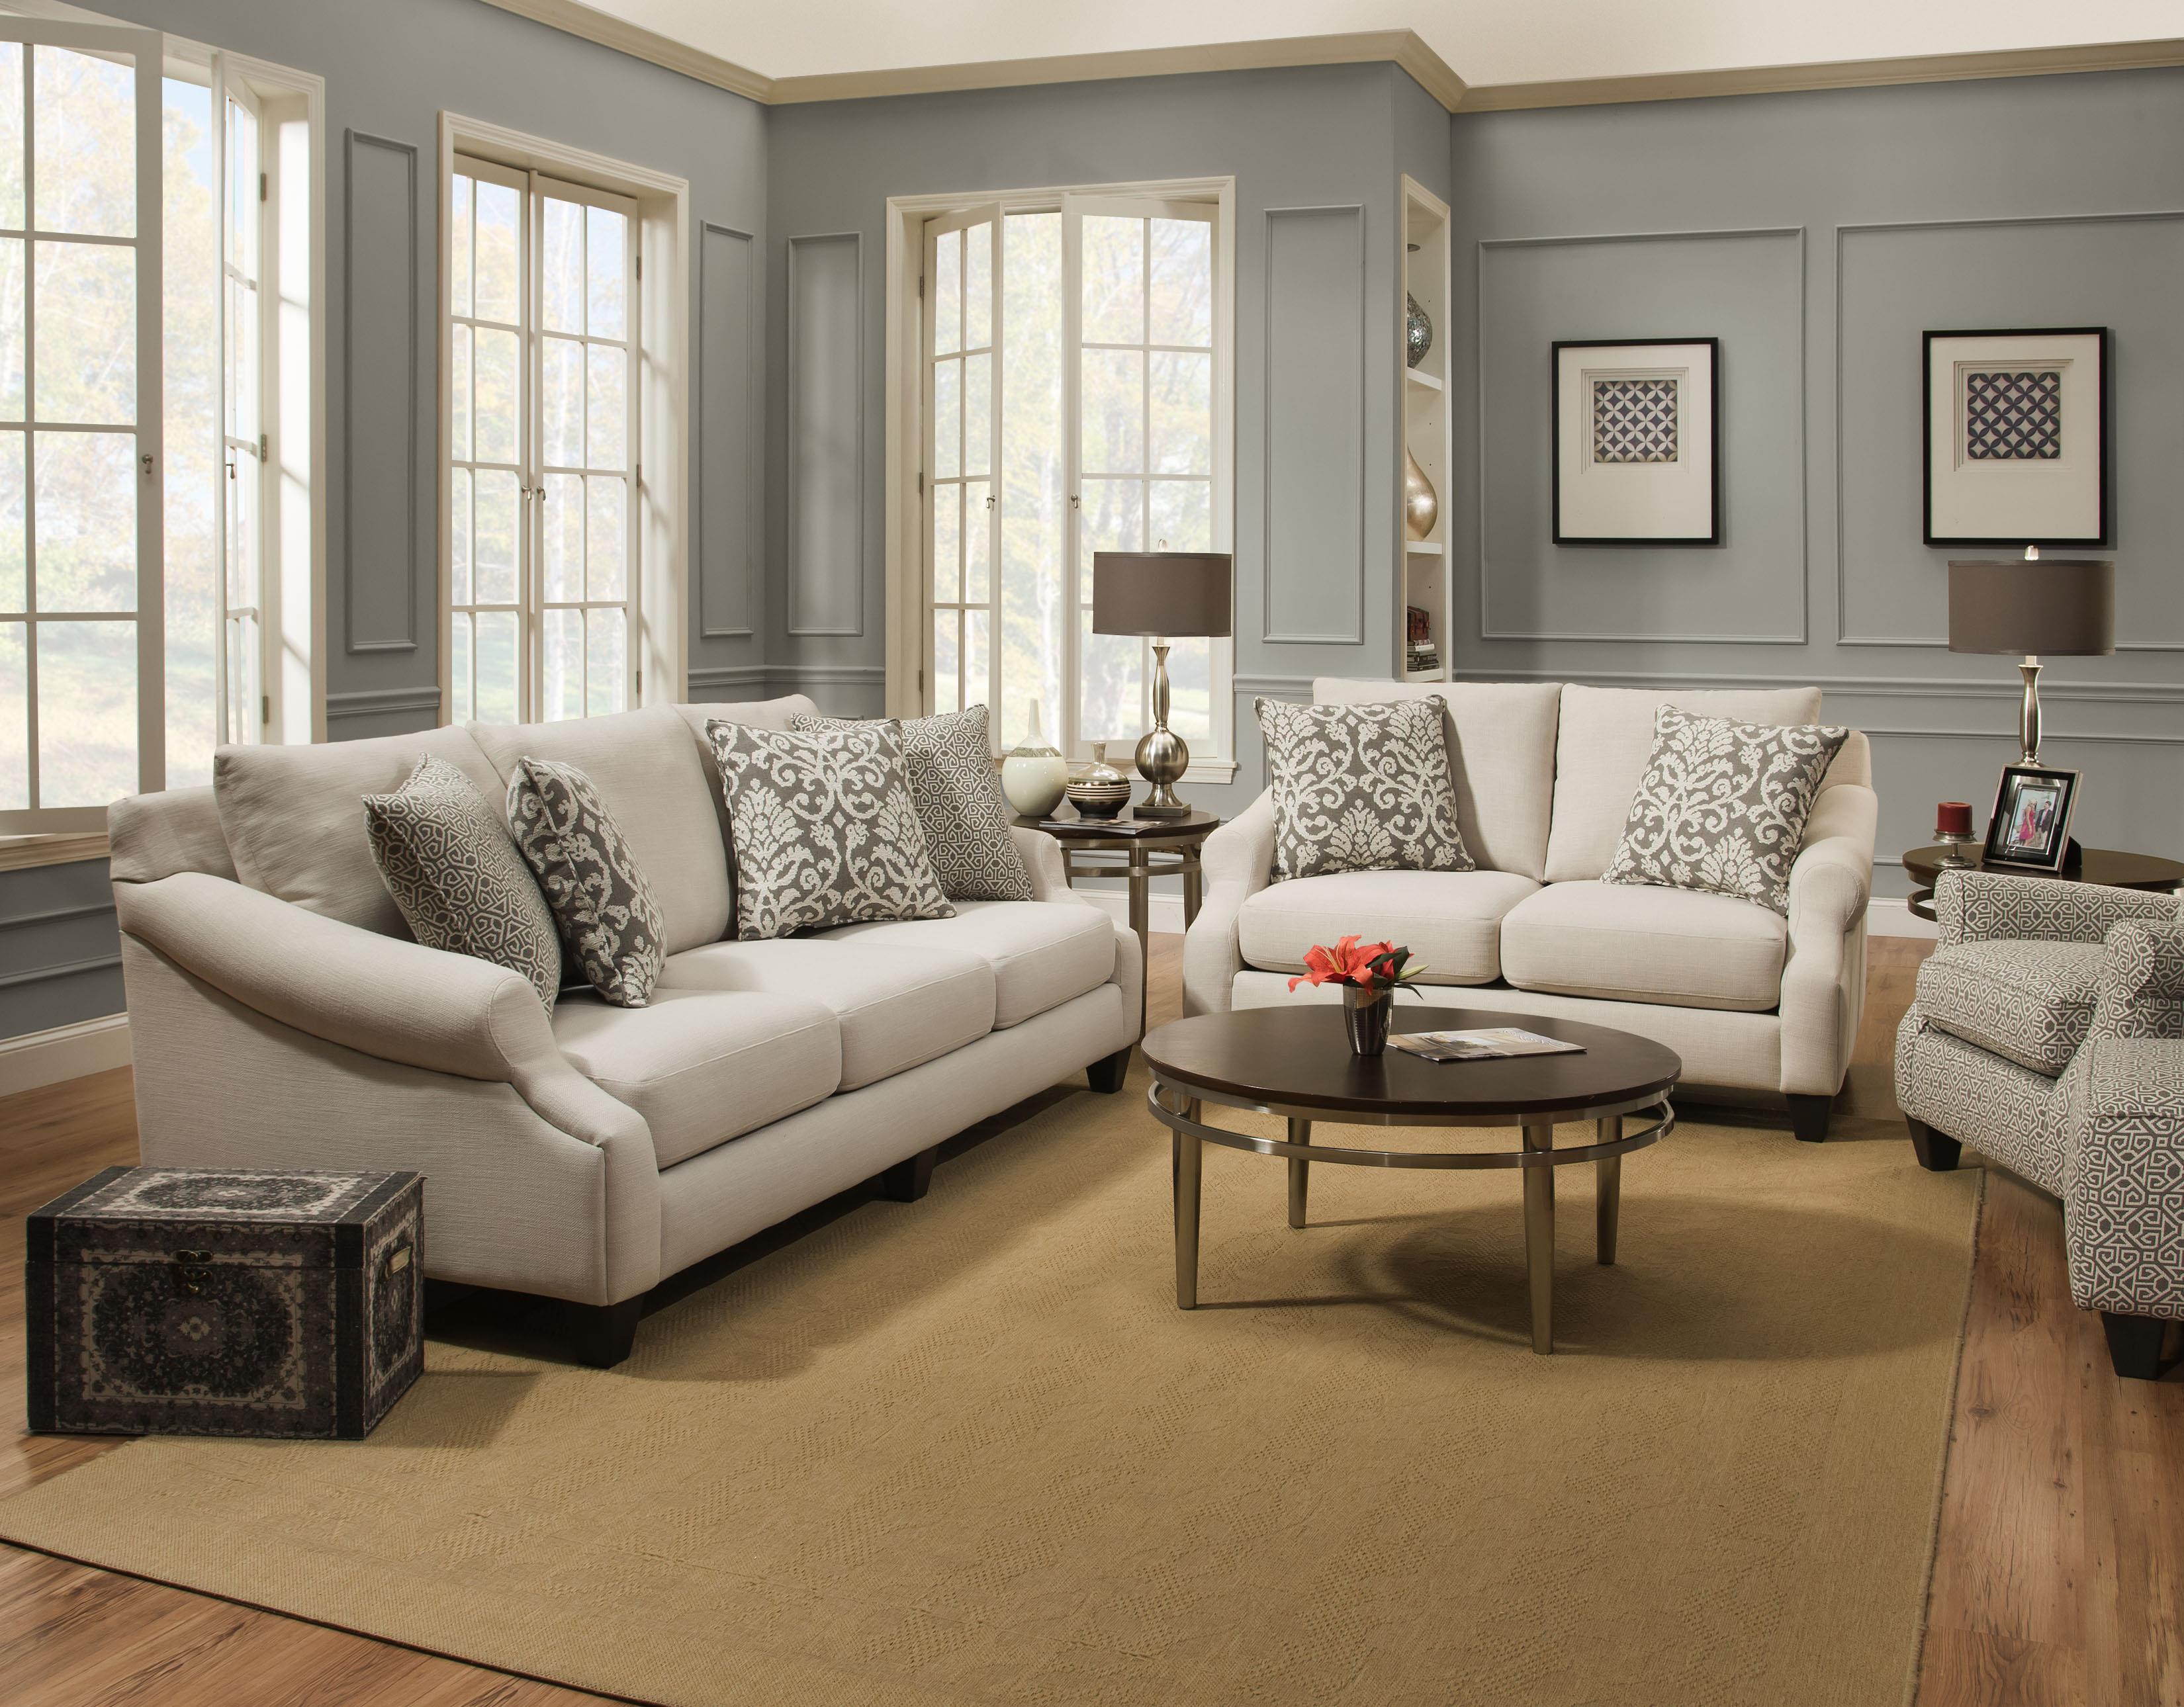 Corinthian 56A0 Lavish Cream Sofa & Loveseat - Item Number: 56A0 Living Room Group 1